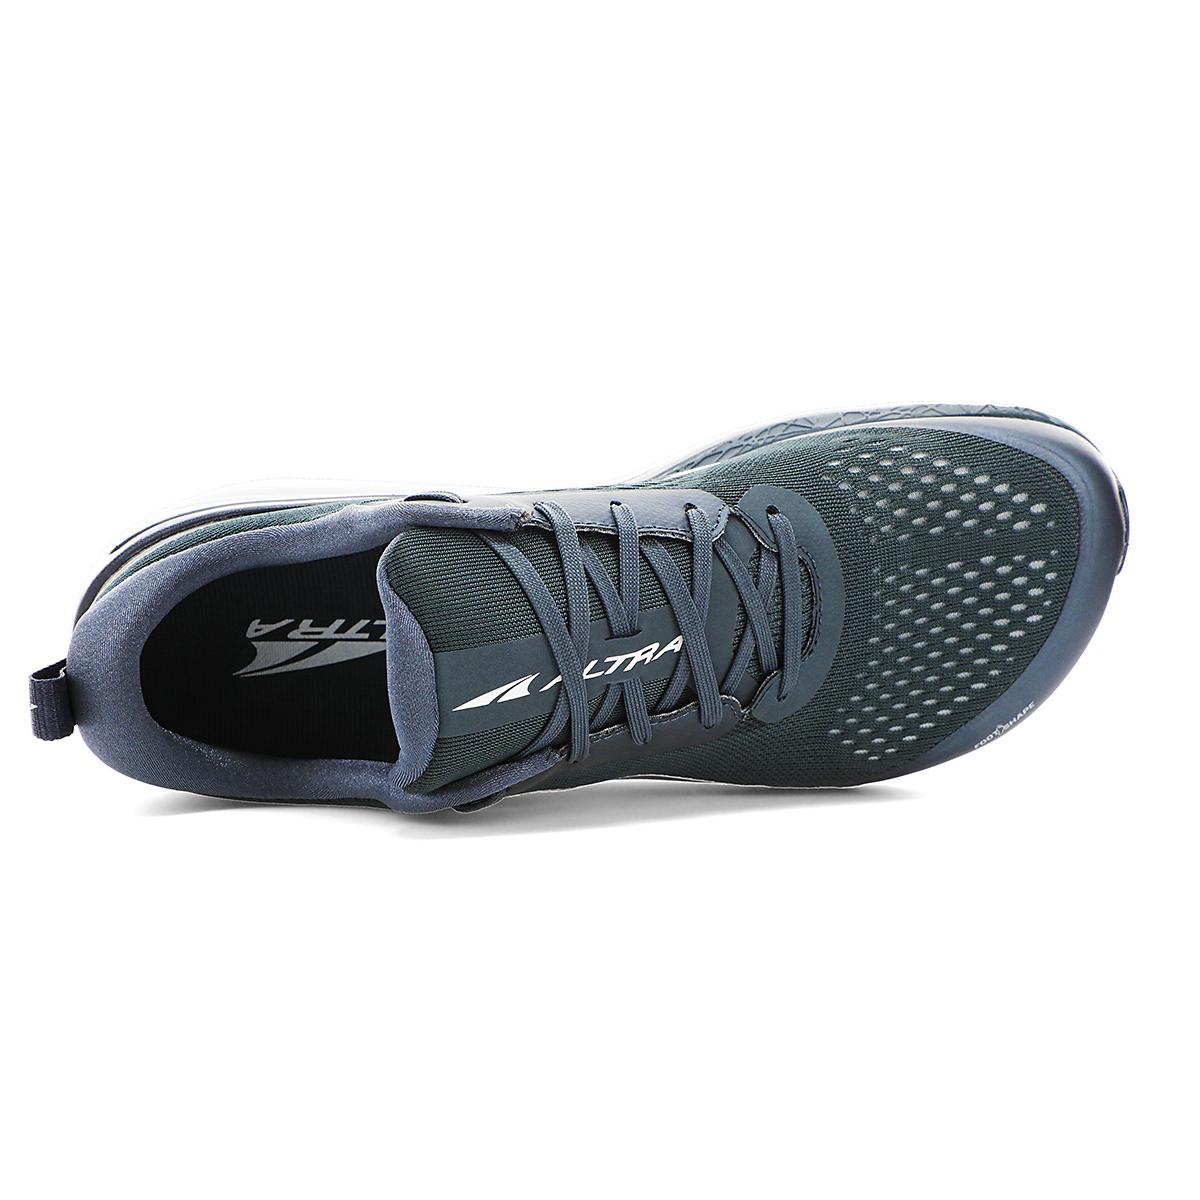 Men's Altra Paradigm 5 Running Shoe - Color: Dark Blue - Size: 7 - Width: Regular, Dark Blue, large, image 3